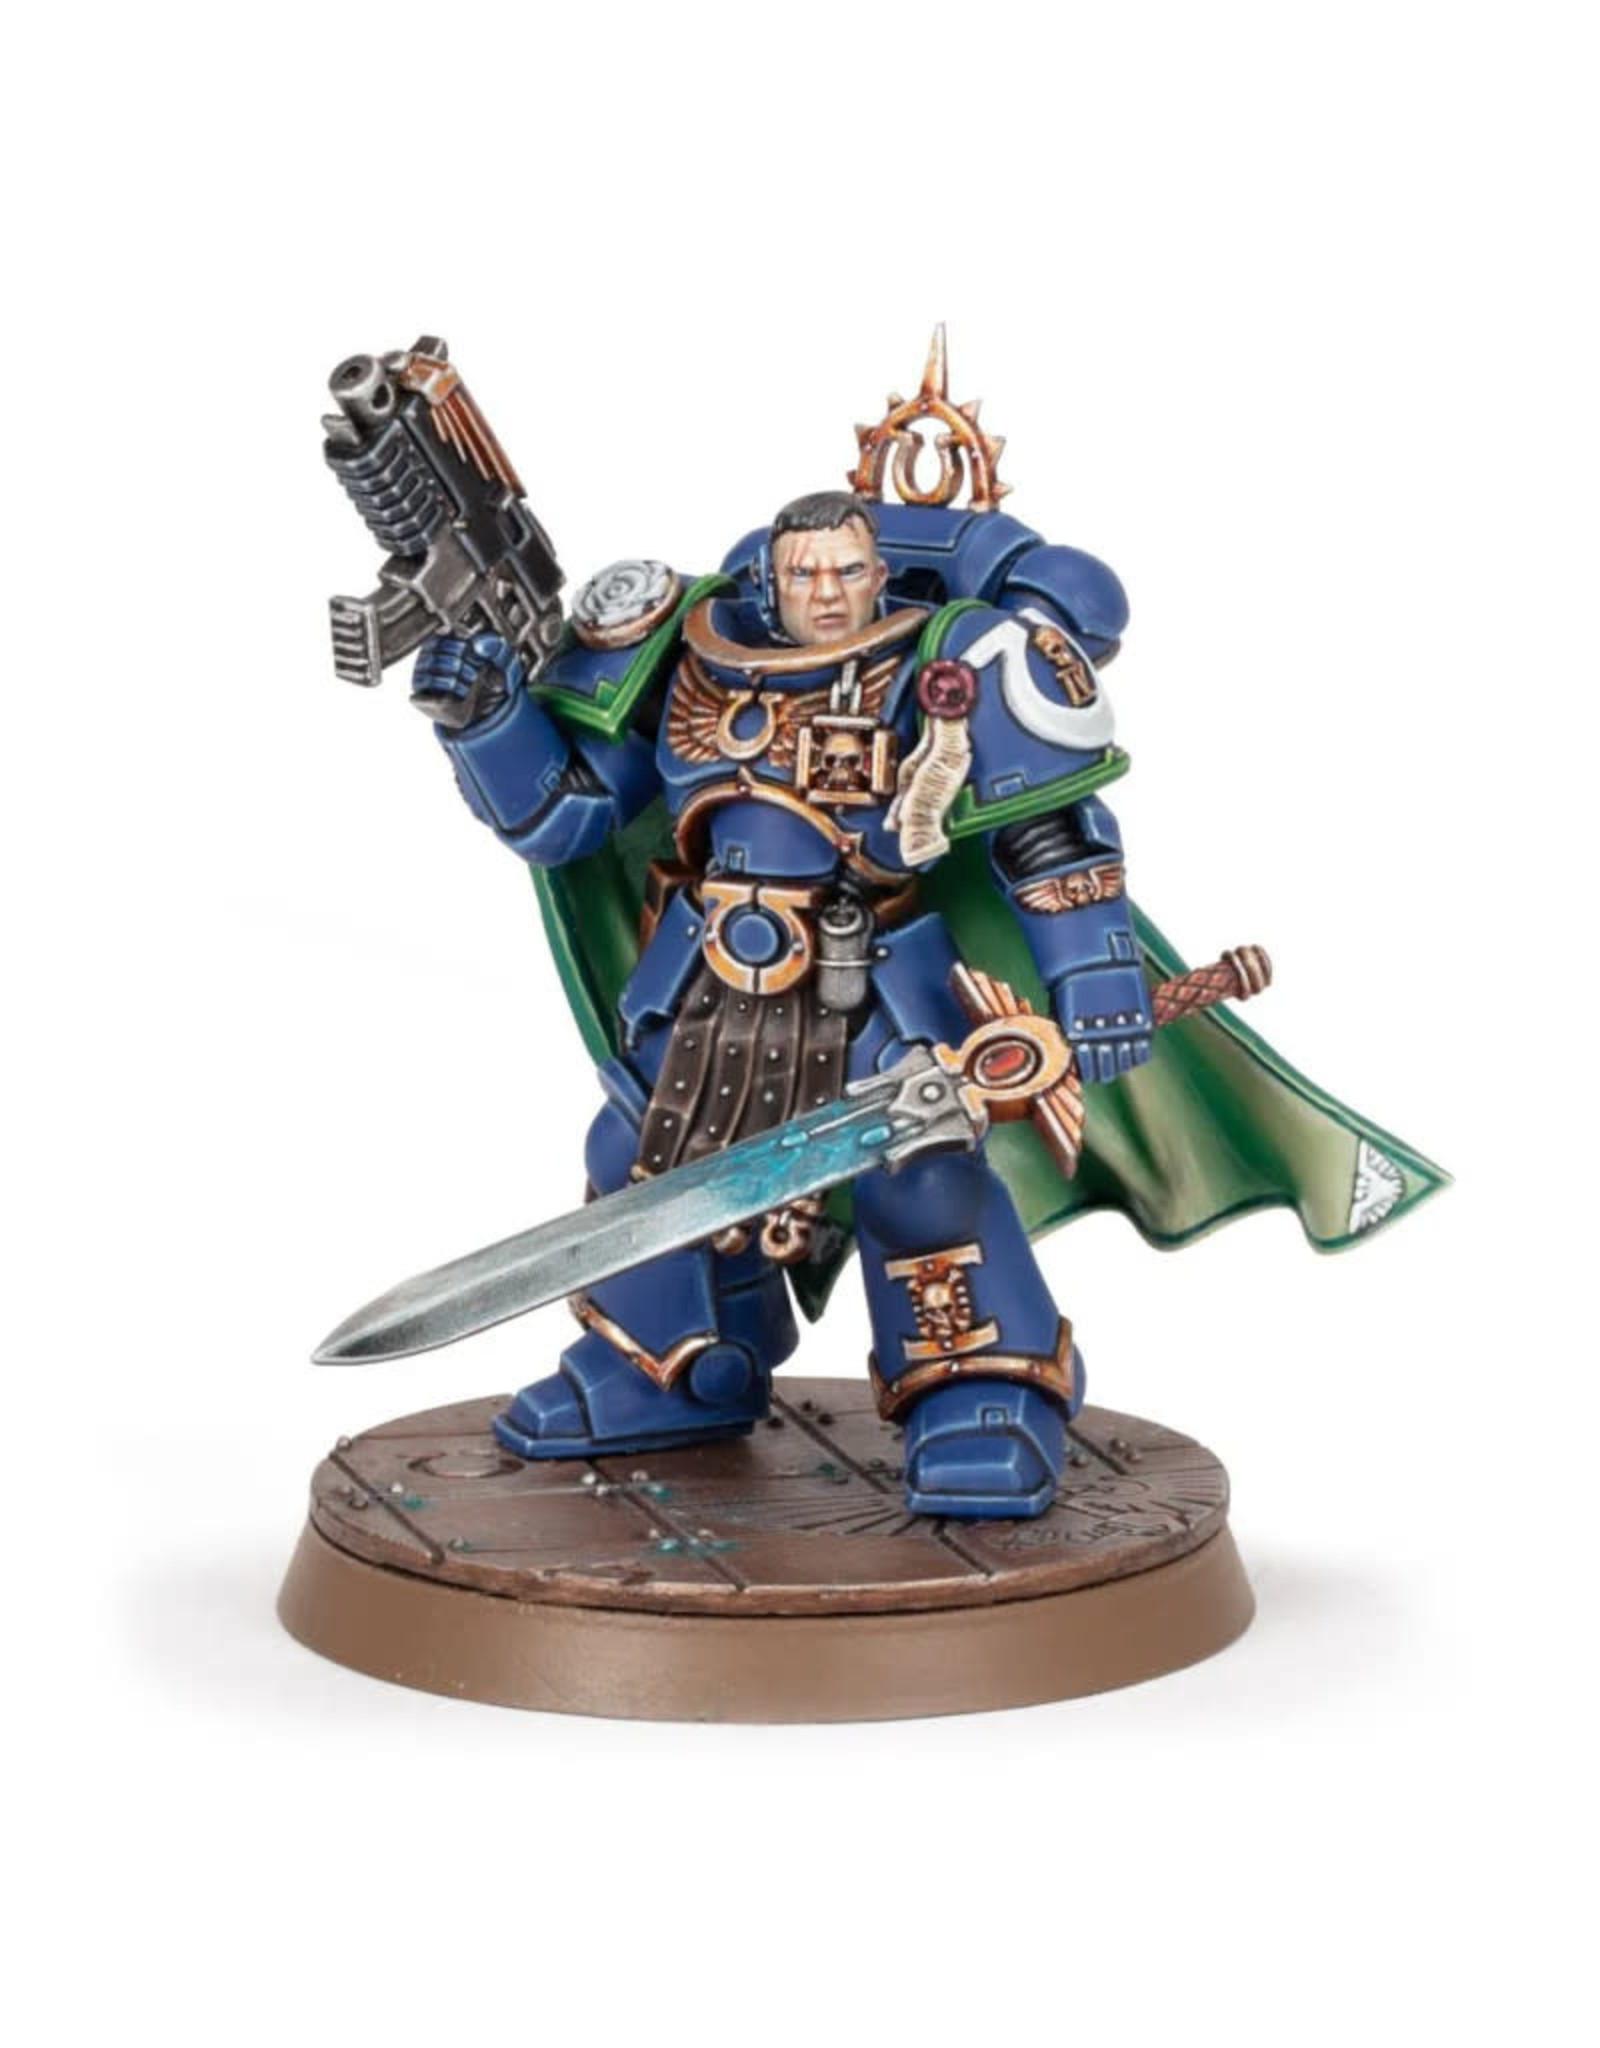 Games Workshop Warhammer 40k Space Marines Captain Uriel Ventris